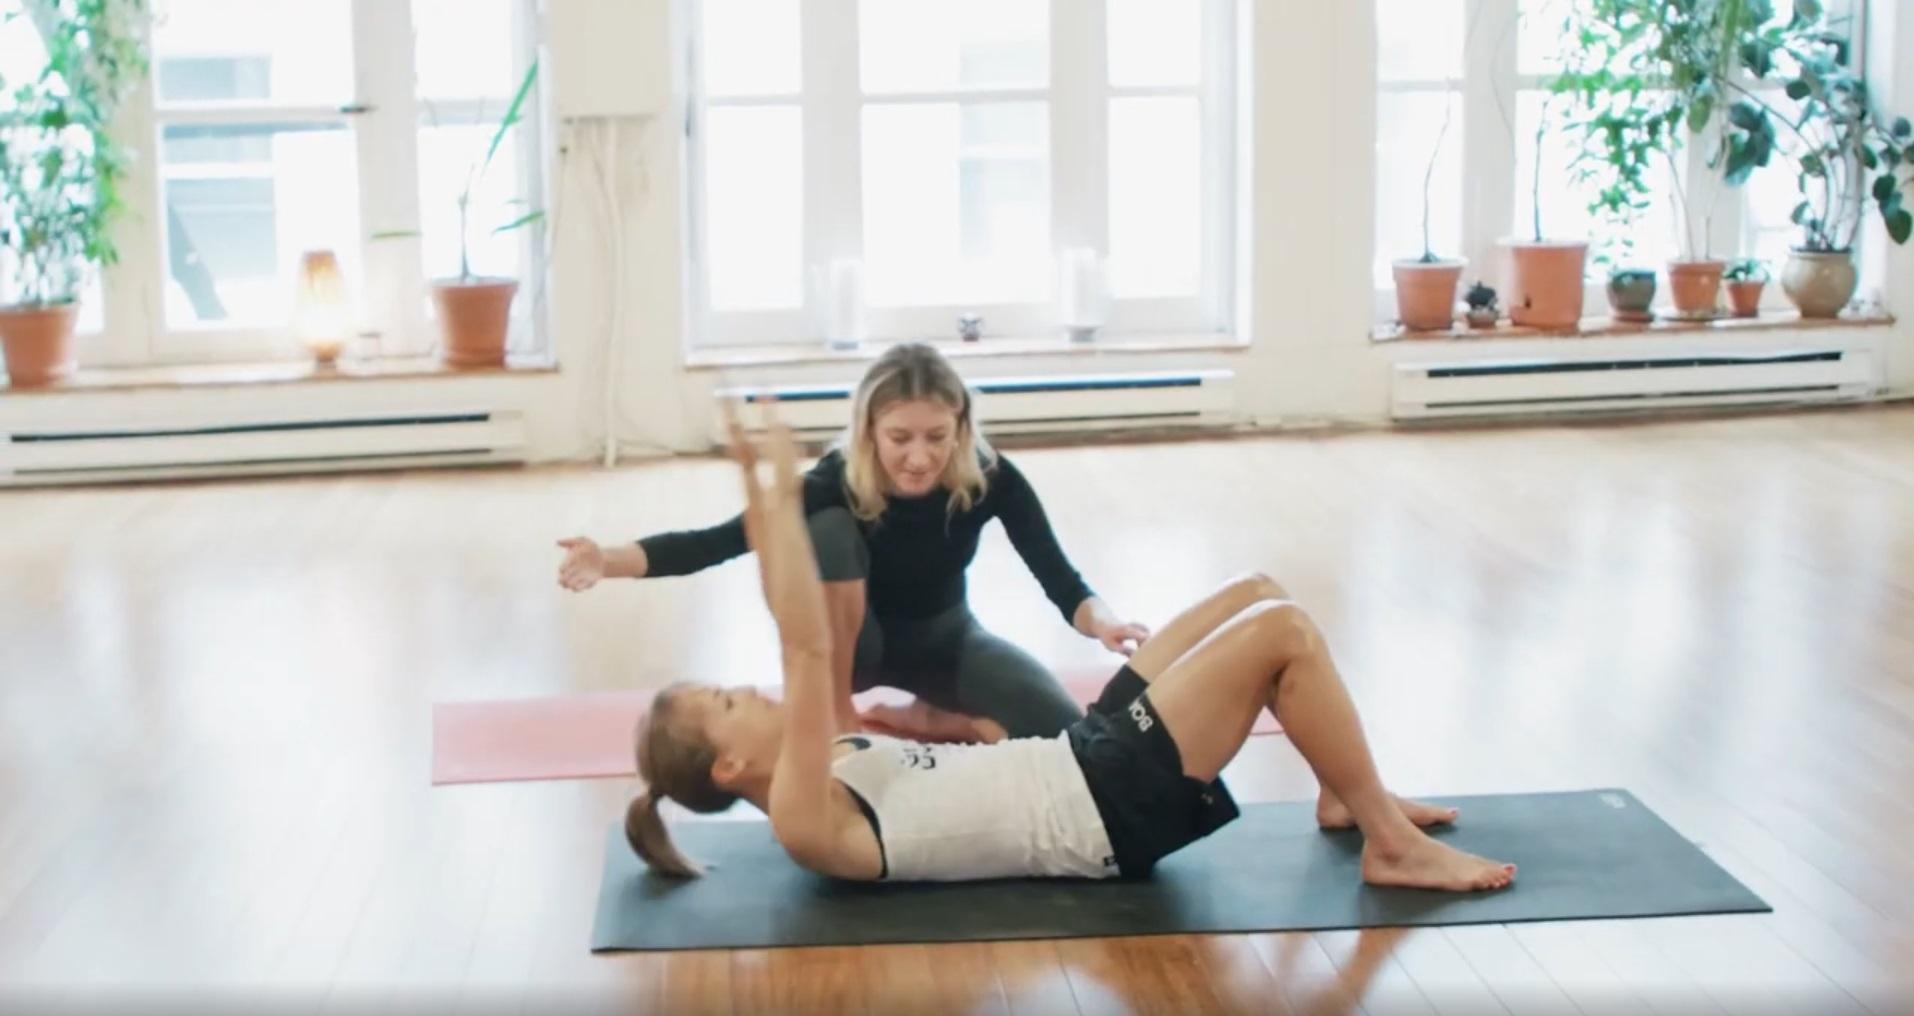 Core workout, Boa system, essentrics, core exercises, fitness, lex albrecht, women's health